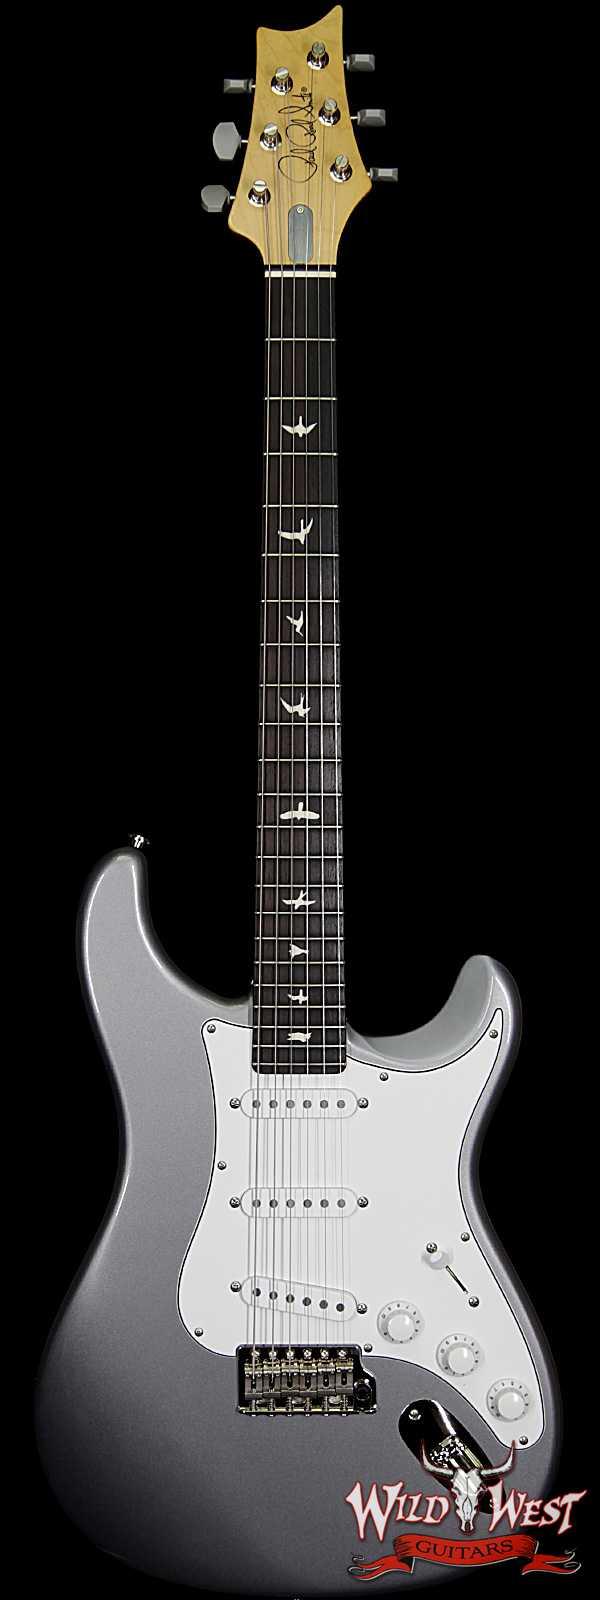 Paul Reed Smith PRS John Mayer Signature Model Silver Sky Maple Neck Rosewood Board Tungsten ( Silver )